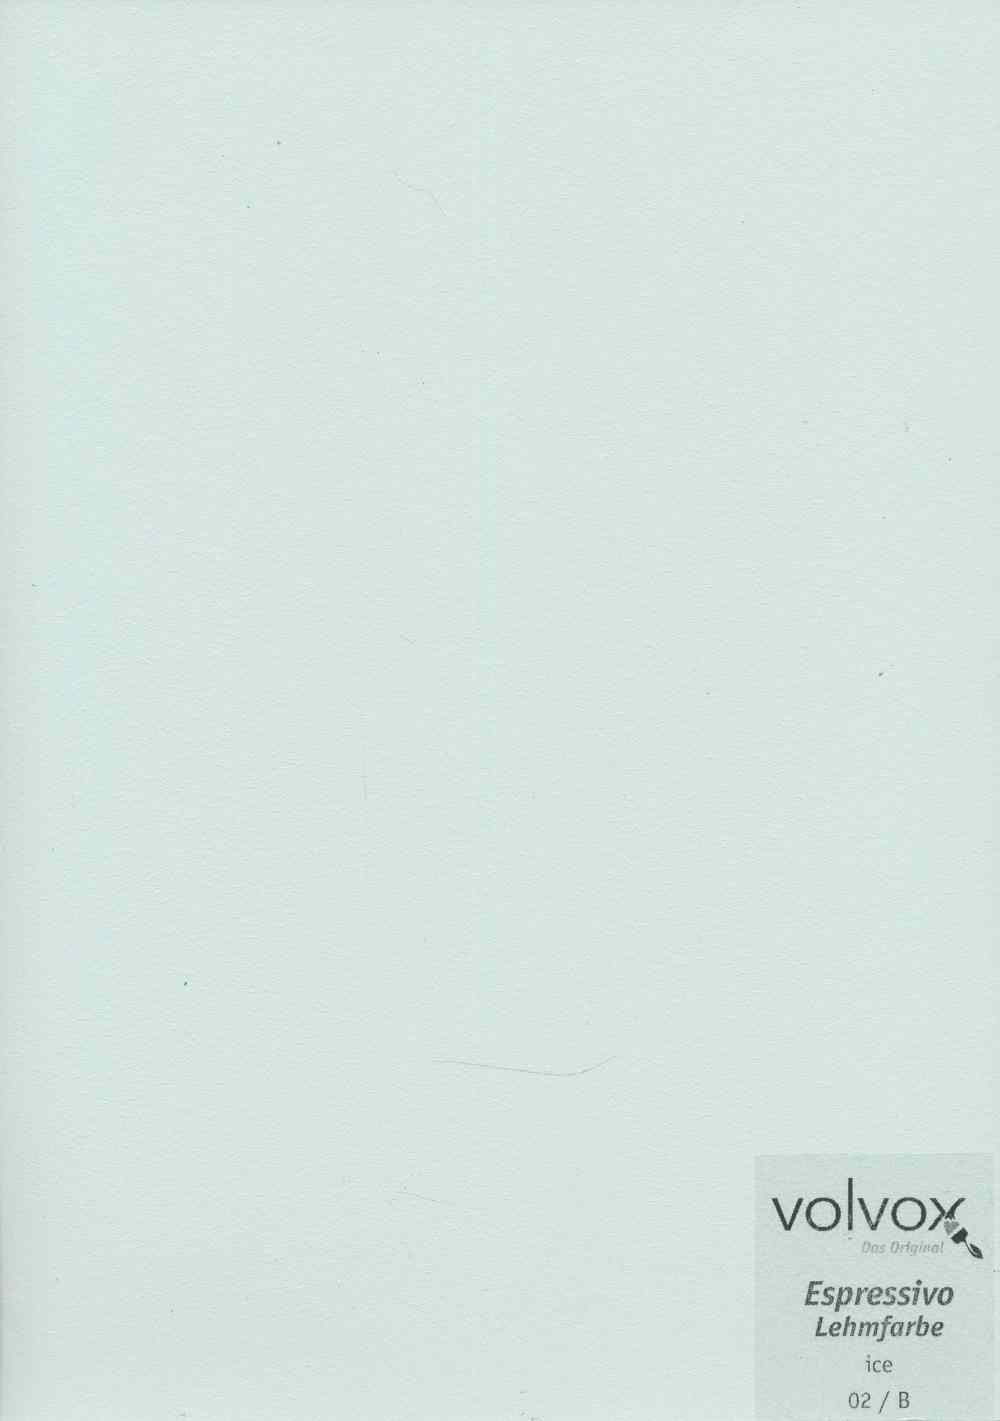 Volvox Espressivo Lehmfarbe 002 ice